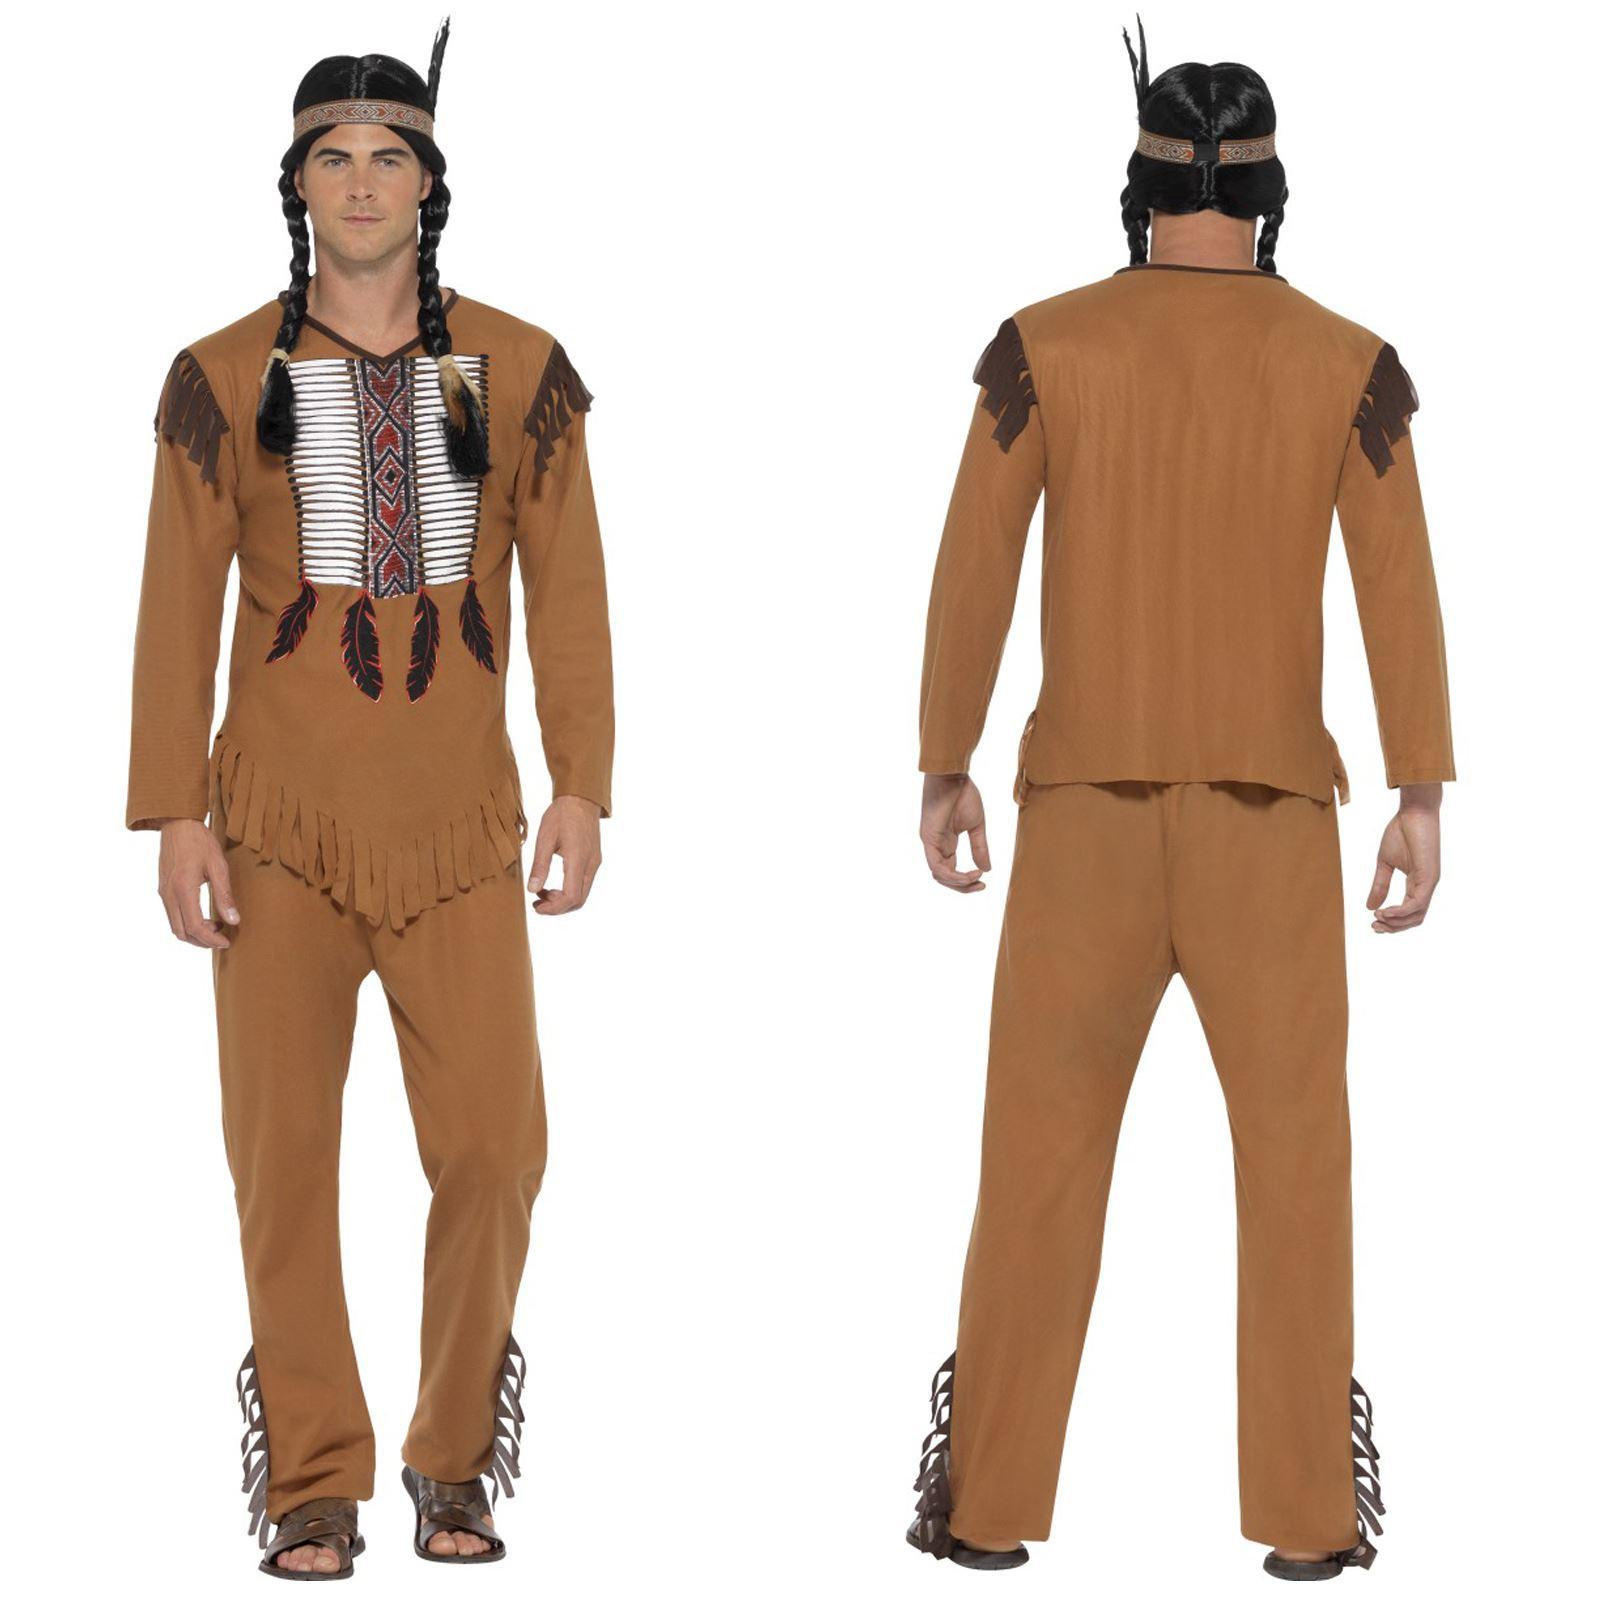 Men's Native Indian Fancy Dress Costume  American Halloween Stag Cowboy Festival